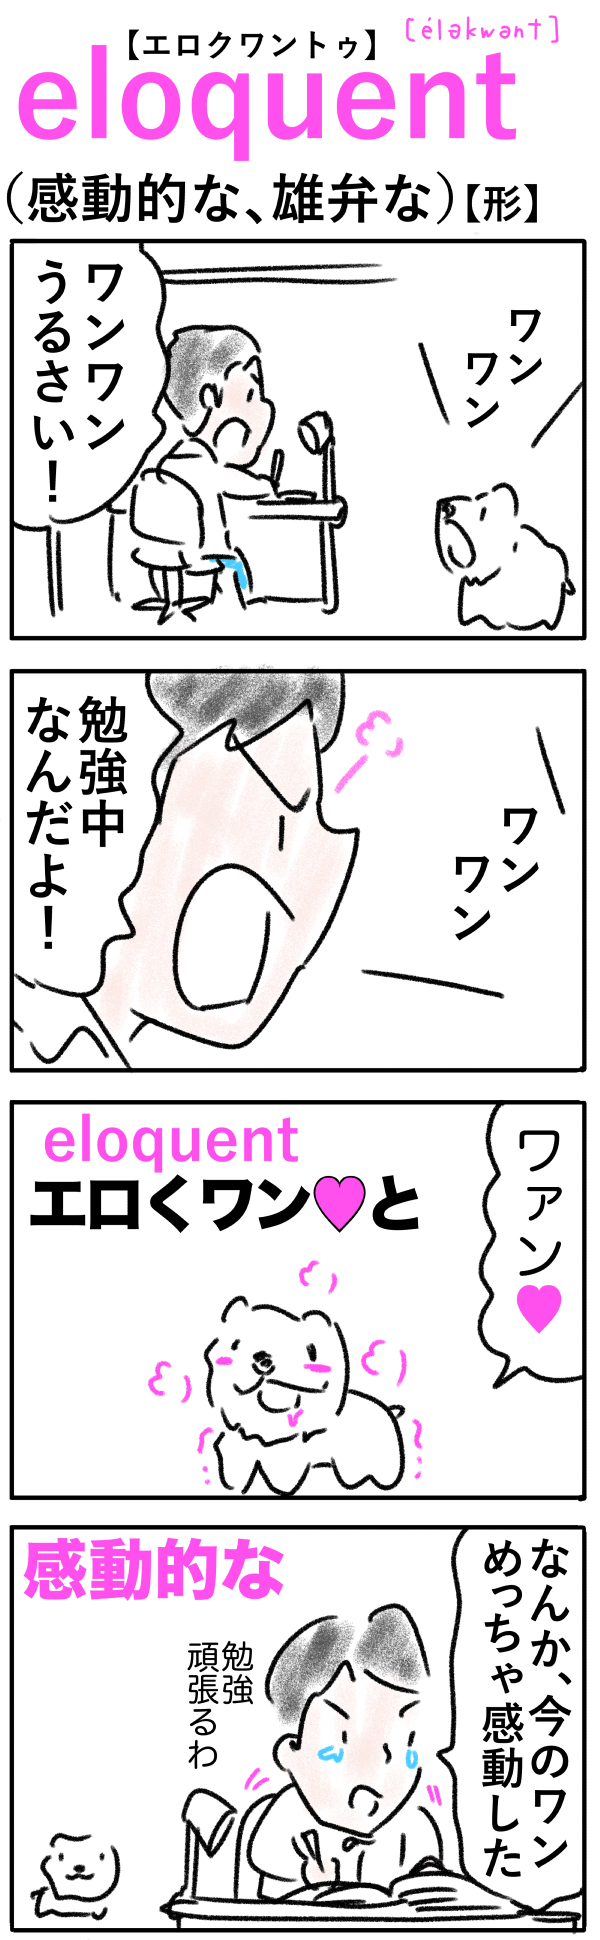 eloquent(感動的な、雄弁な)の語呂合わせ英単語